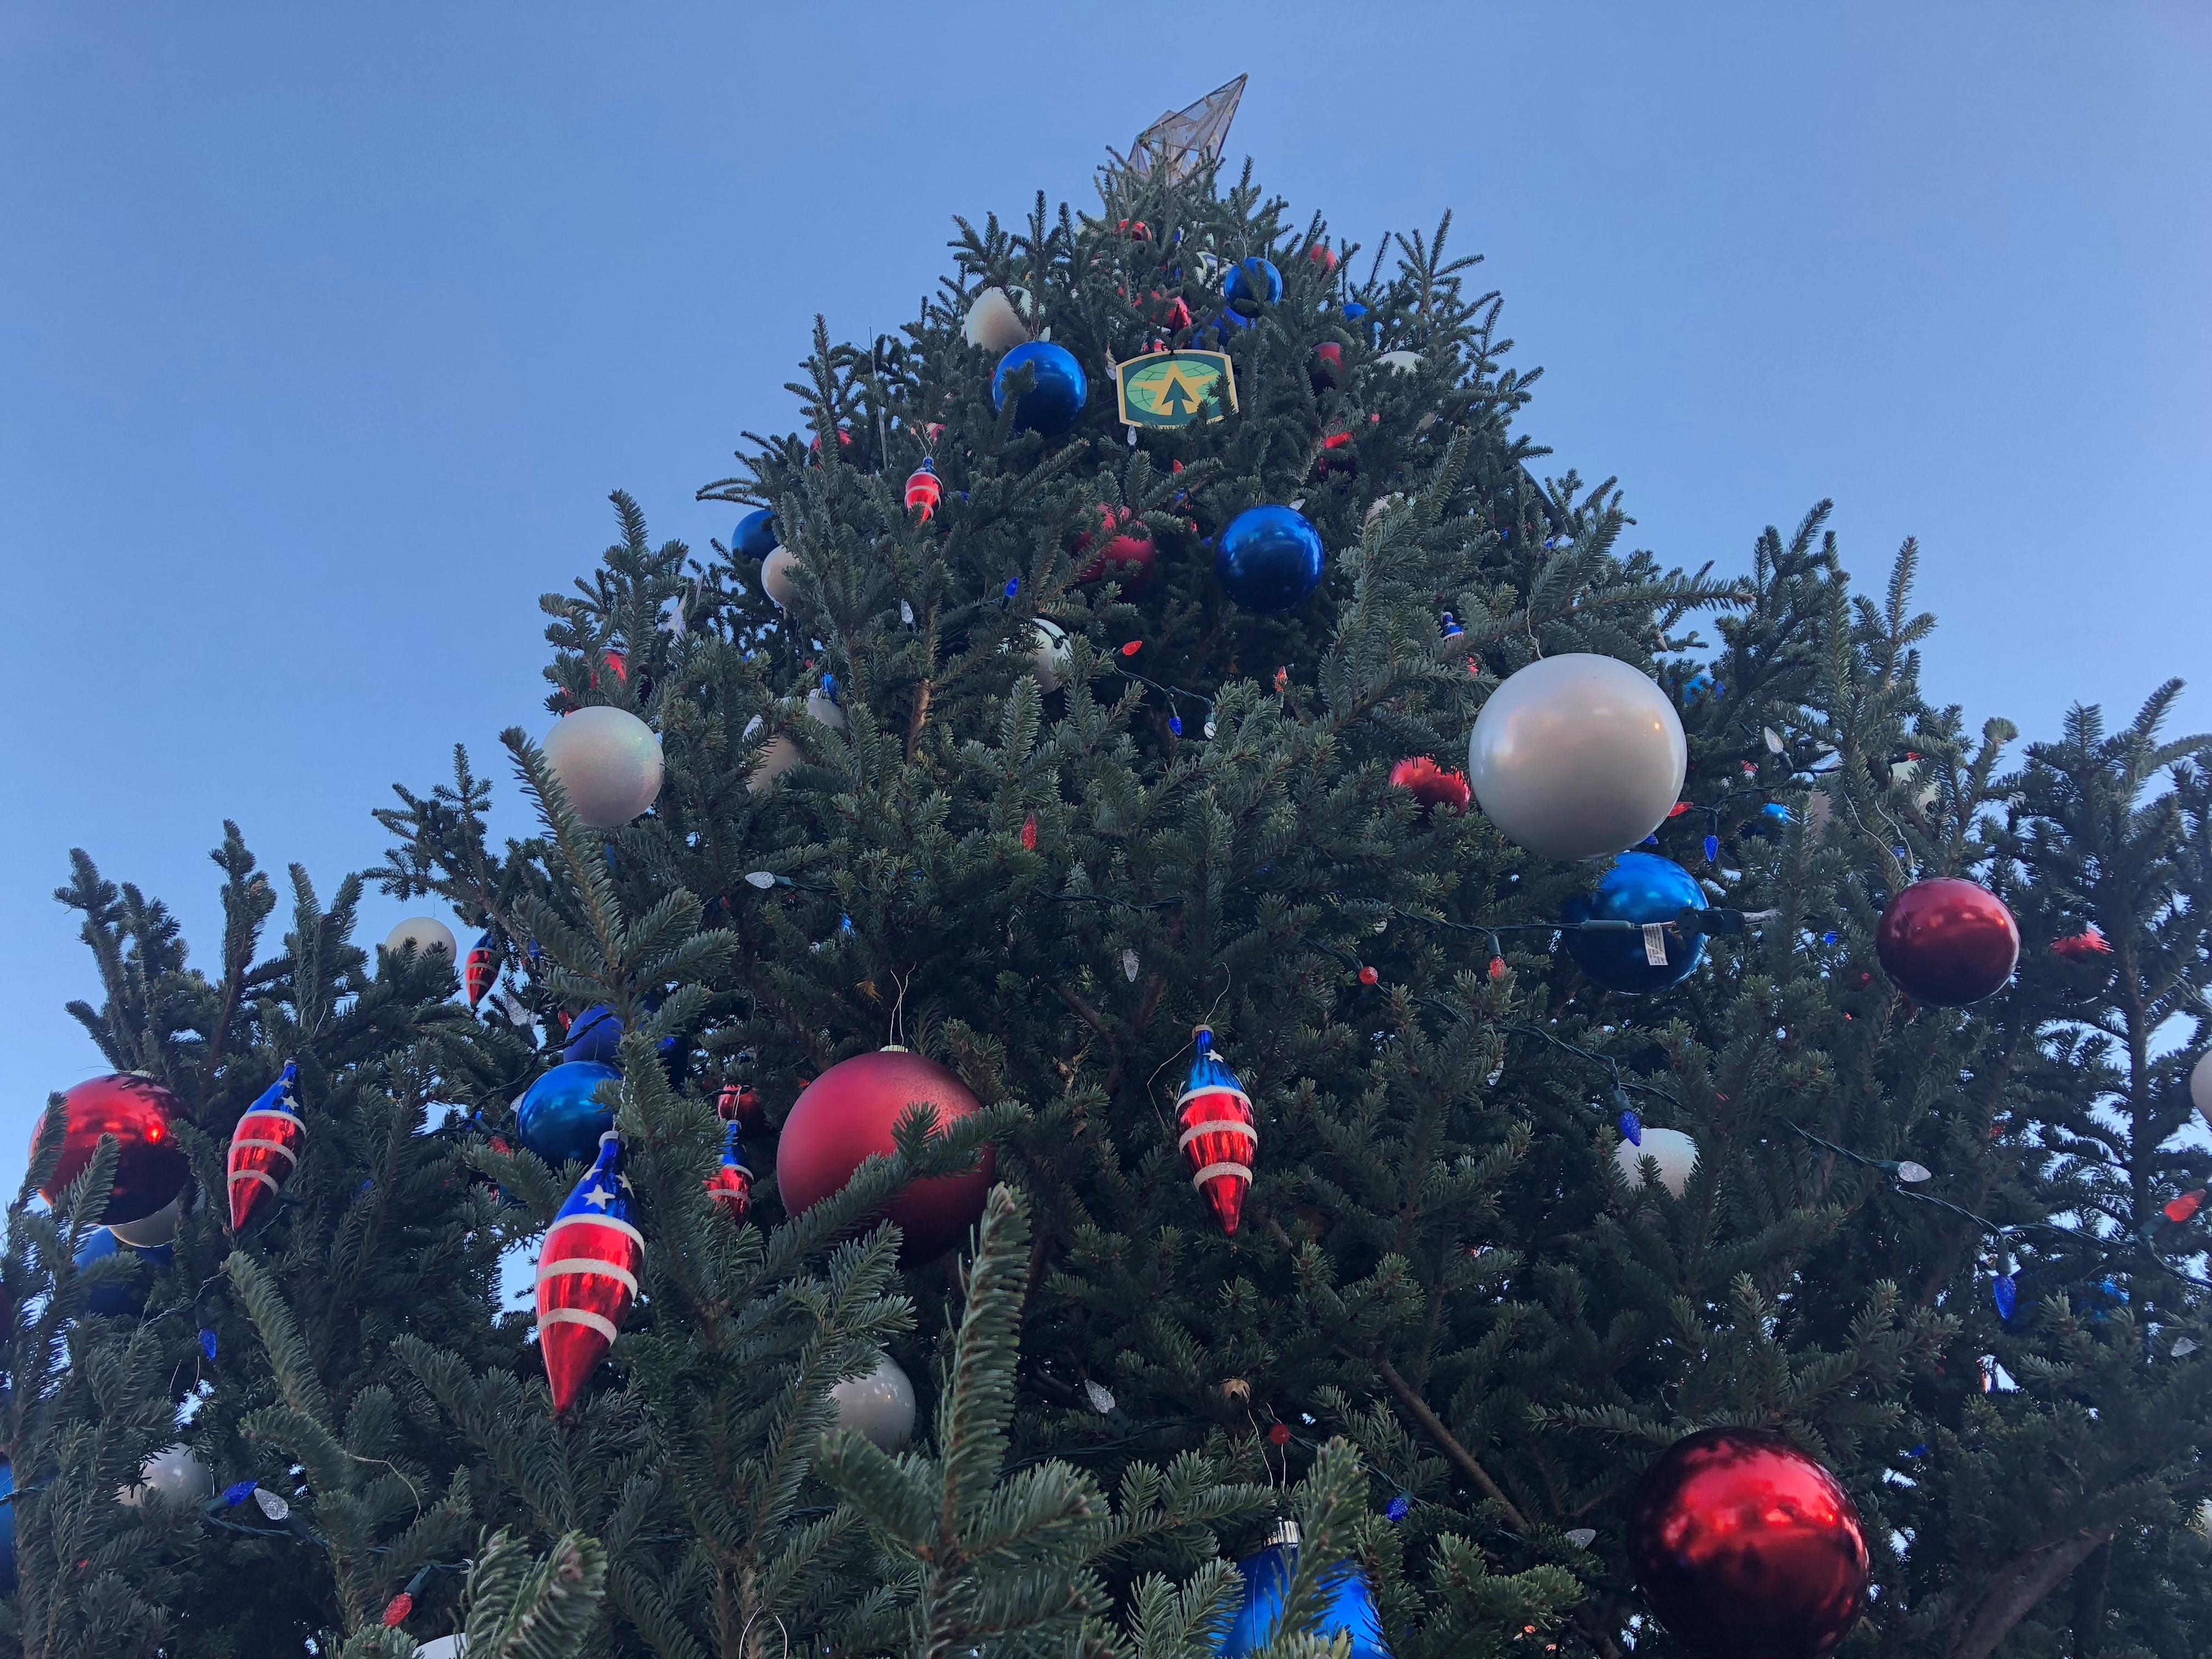 "<div class=""meta image-caption""><div class=""origin-logo origin-image wtvd""><span>WTVD</span></div><span class=""caption-text"">Scenes from the Fort Bragg tree lighting Thursday, Nov. 29, 2018 (Akilah Davis)</span></div>"